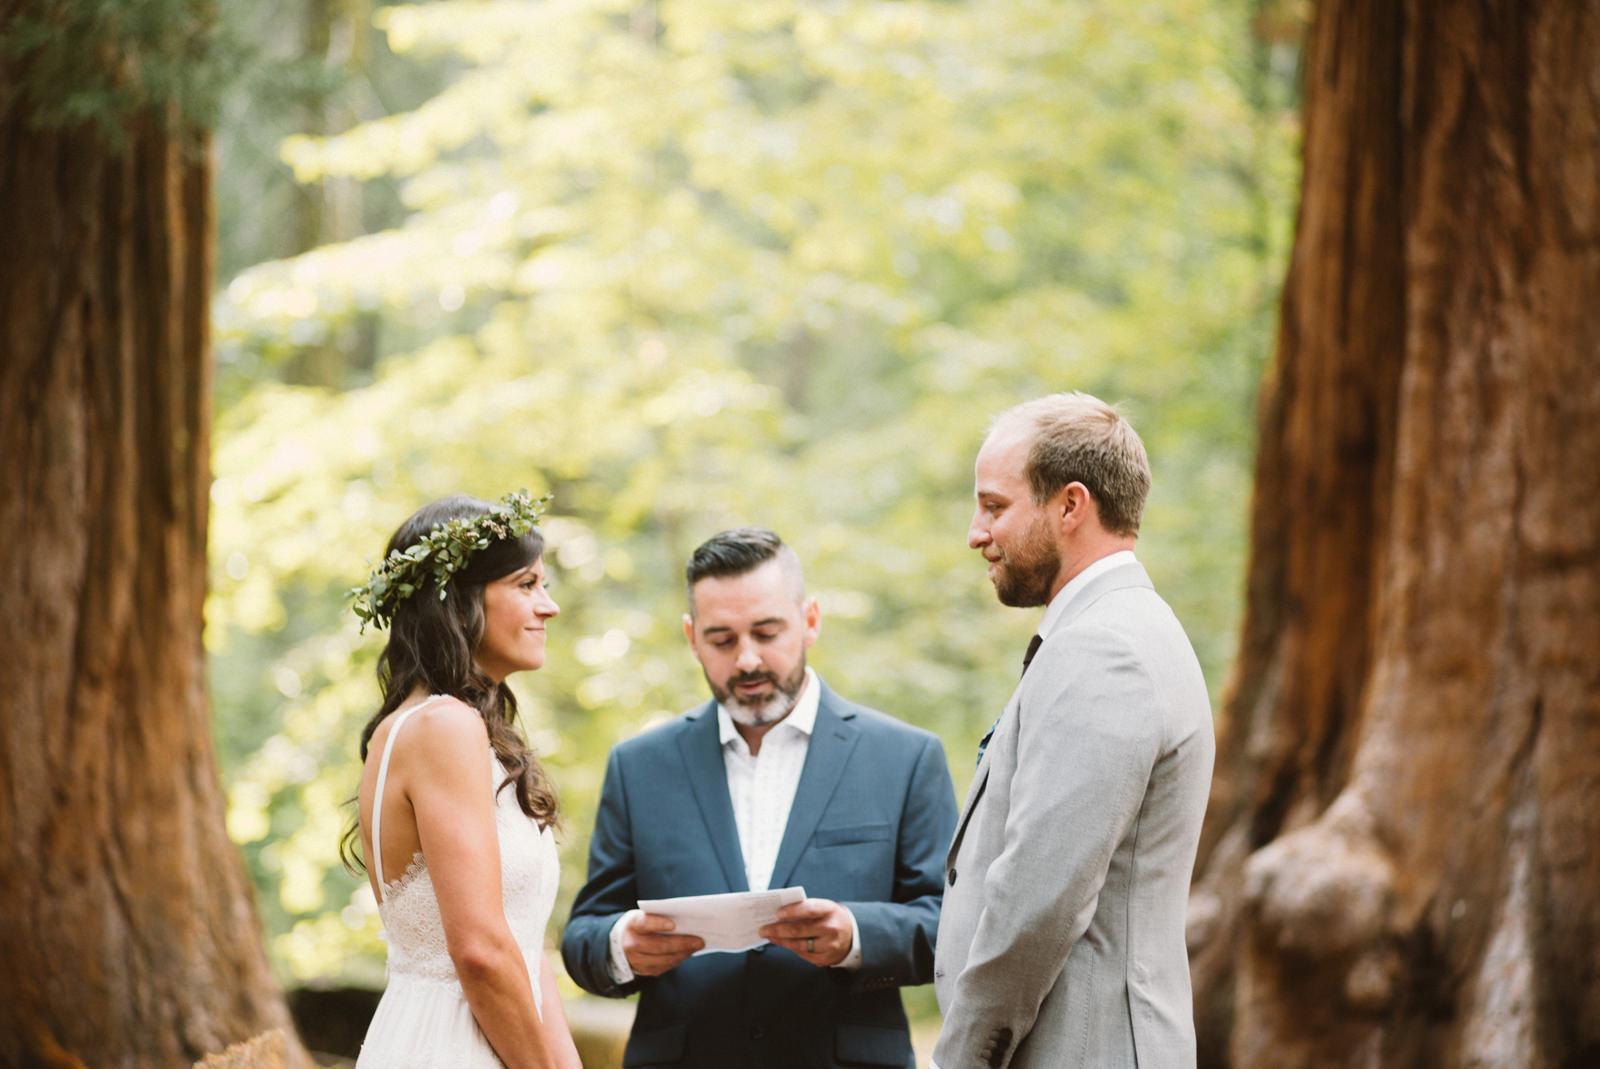 yosemite-intimate-wedding-050 YOSEMITE INTIMATE WEDDING